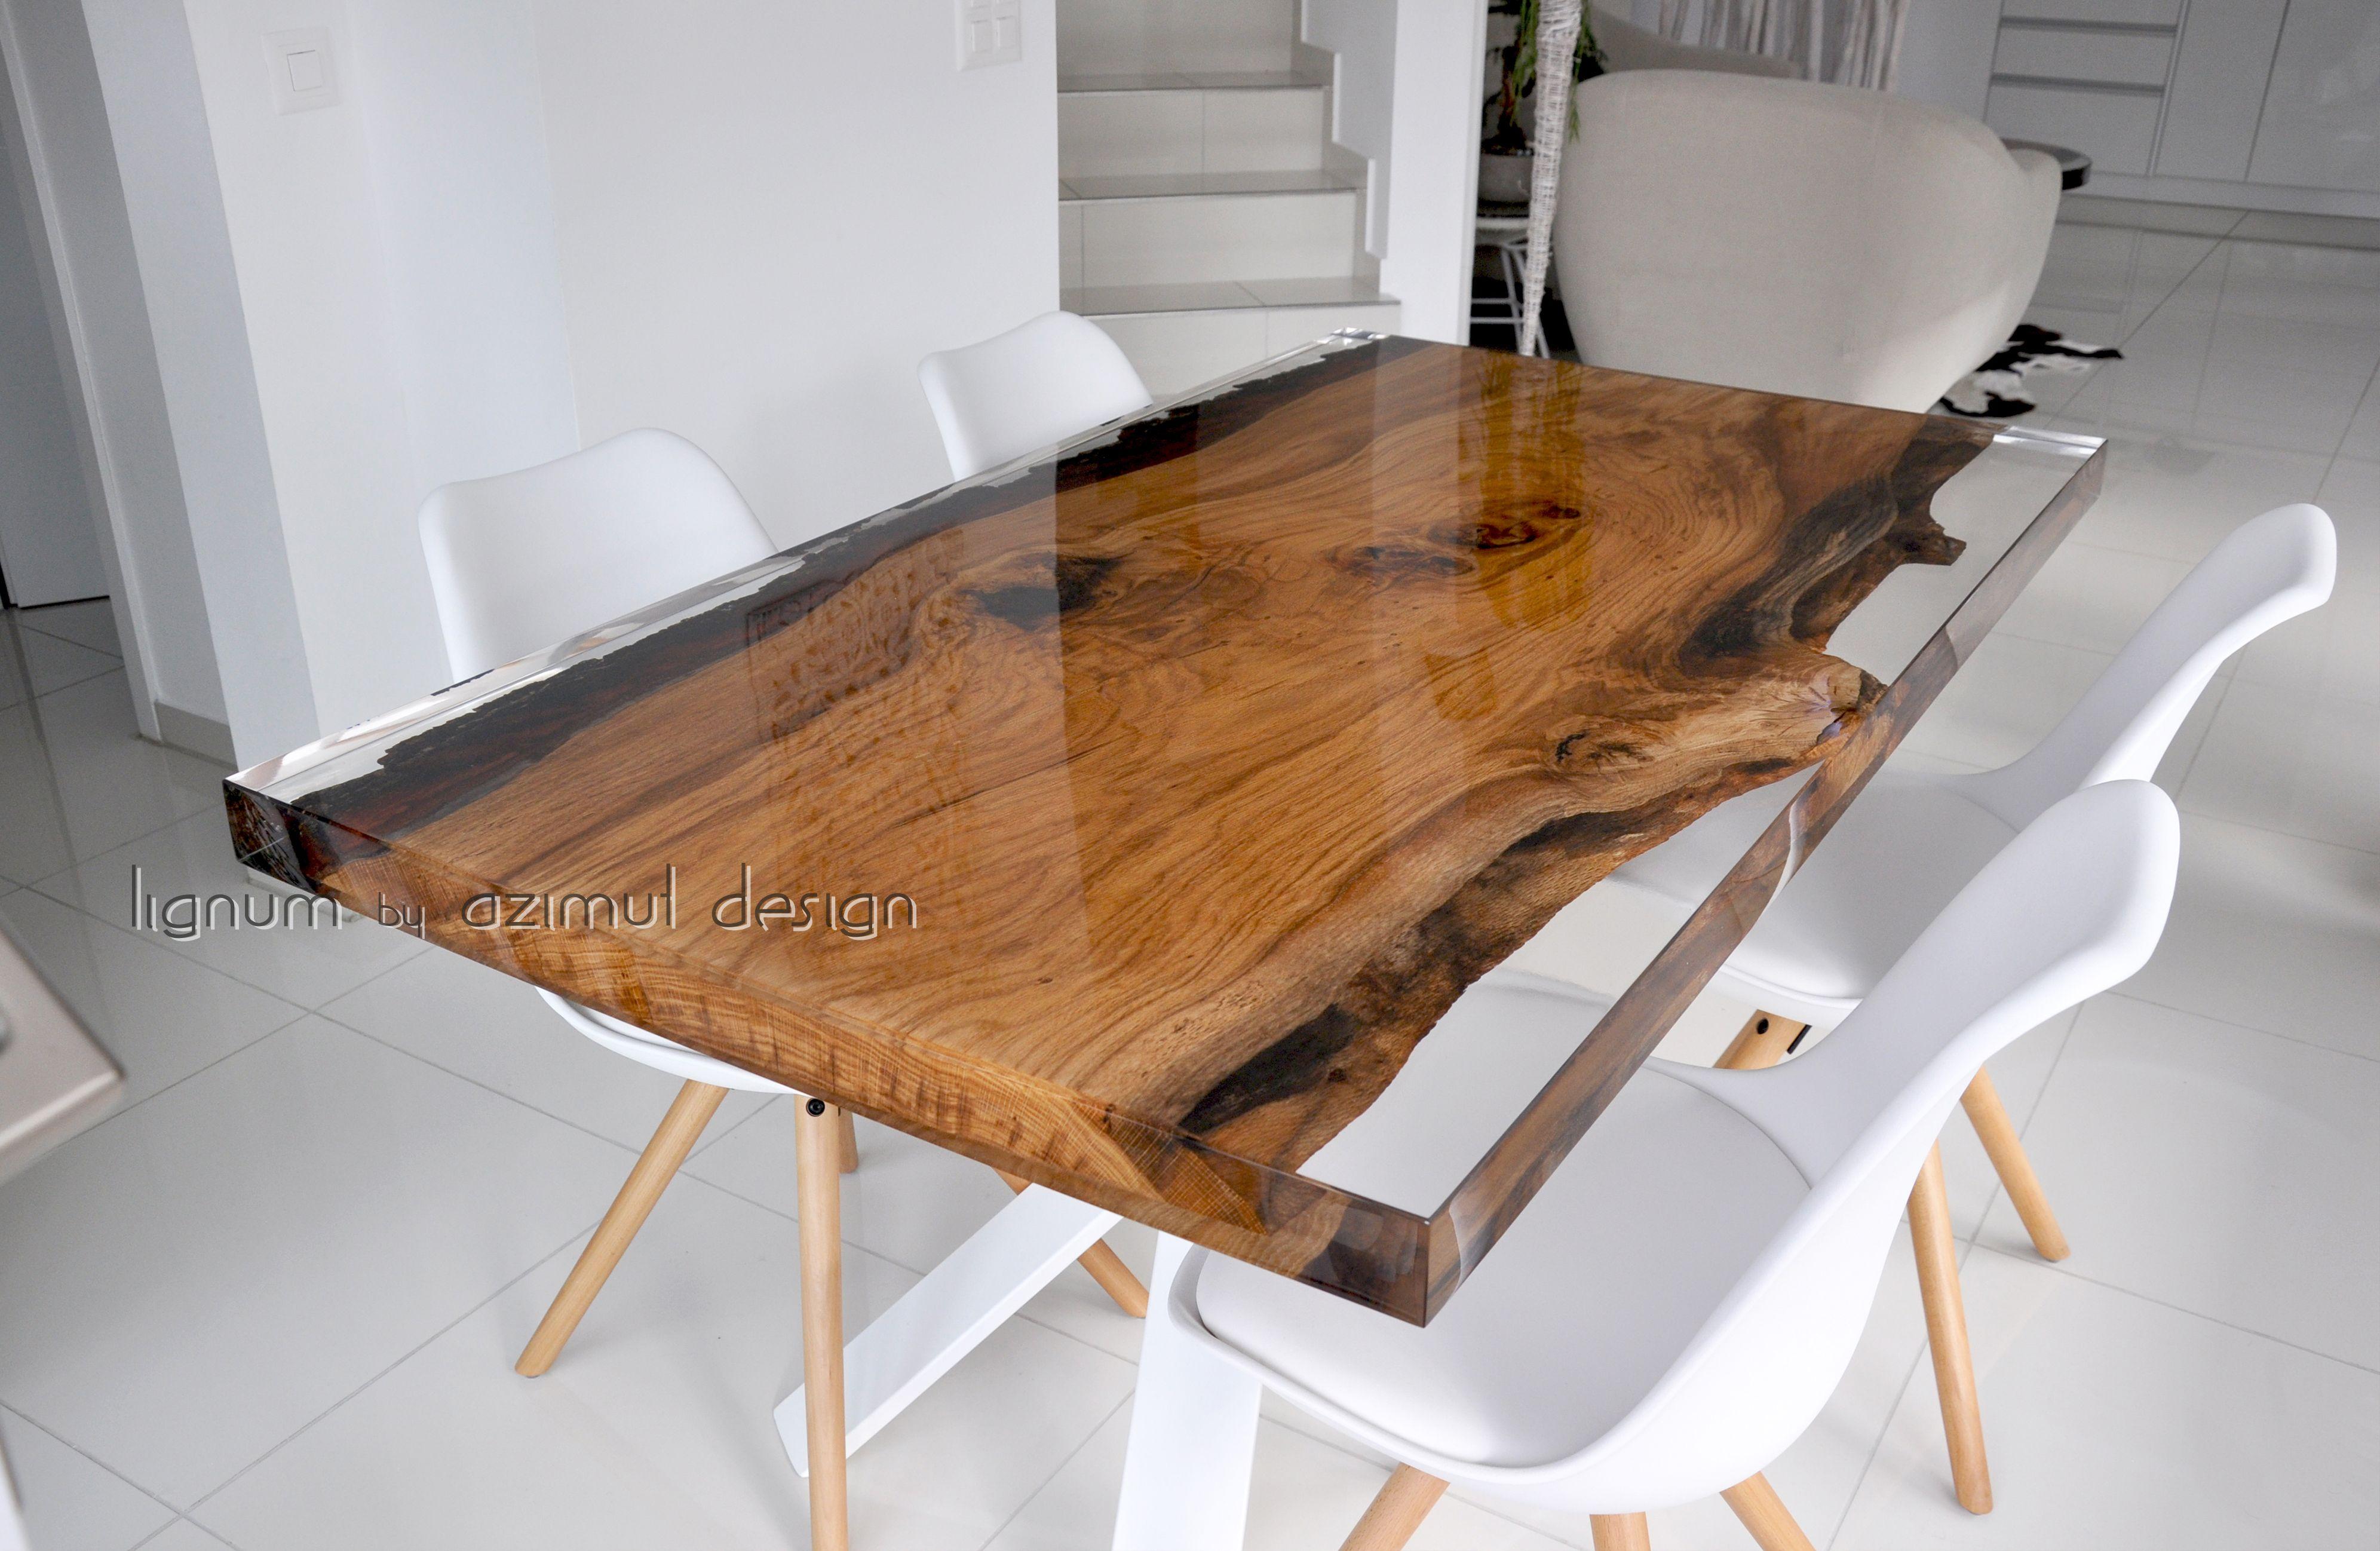 In Legno Wood Design elementi di design per arredo interni in resina: soluzioni